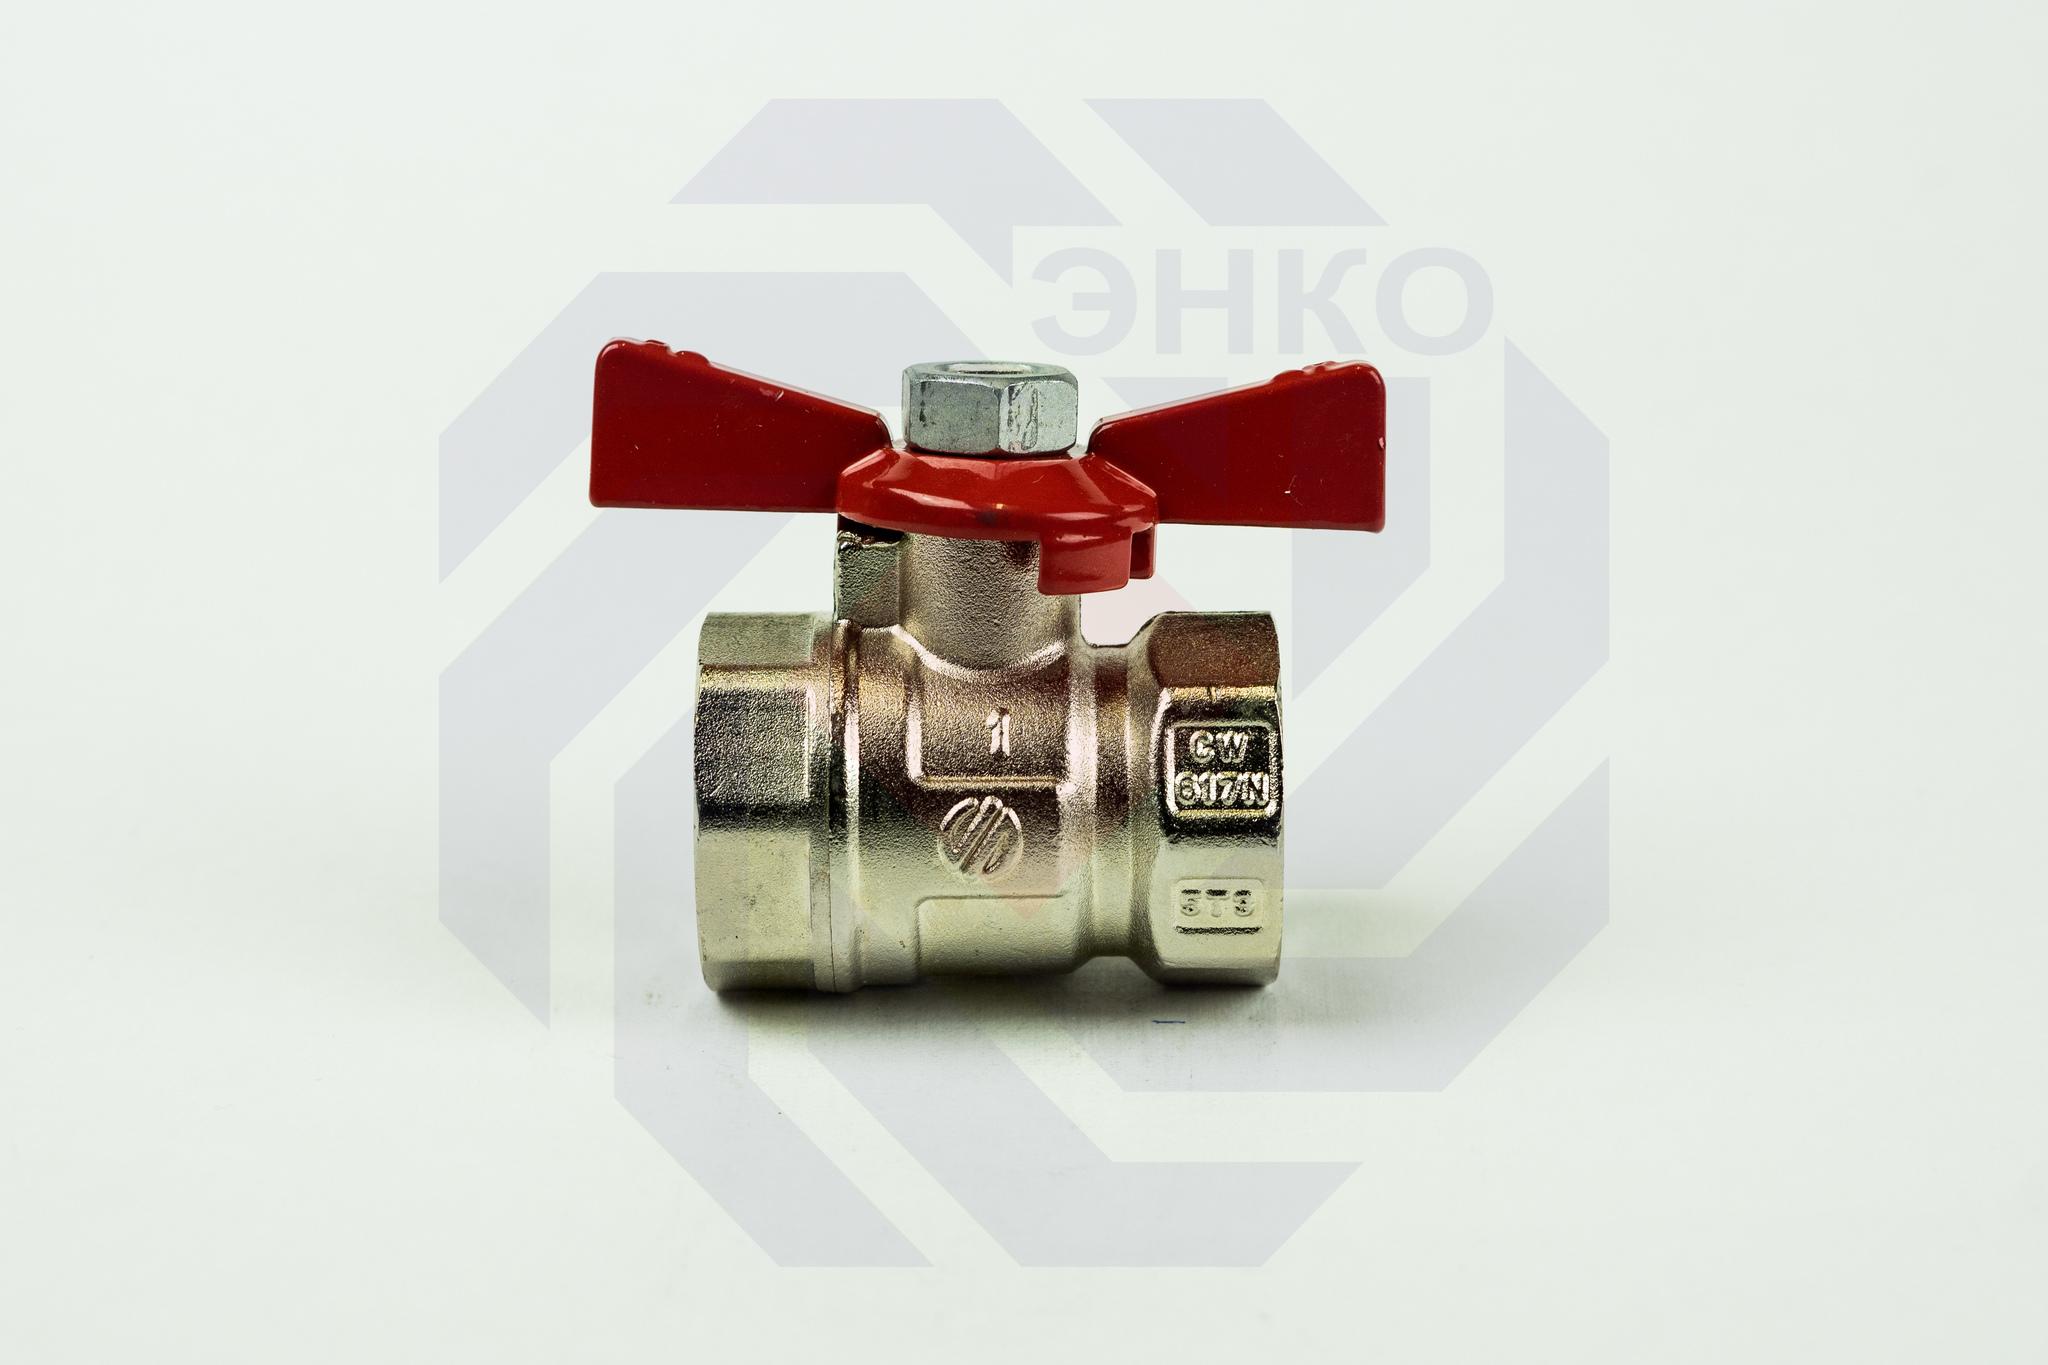 Кран шаровой с ВР/ВР резьбой ARCO NILE 1